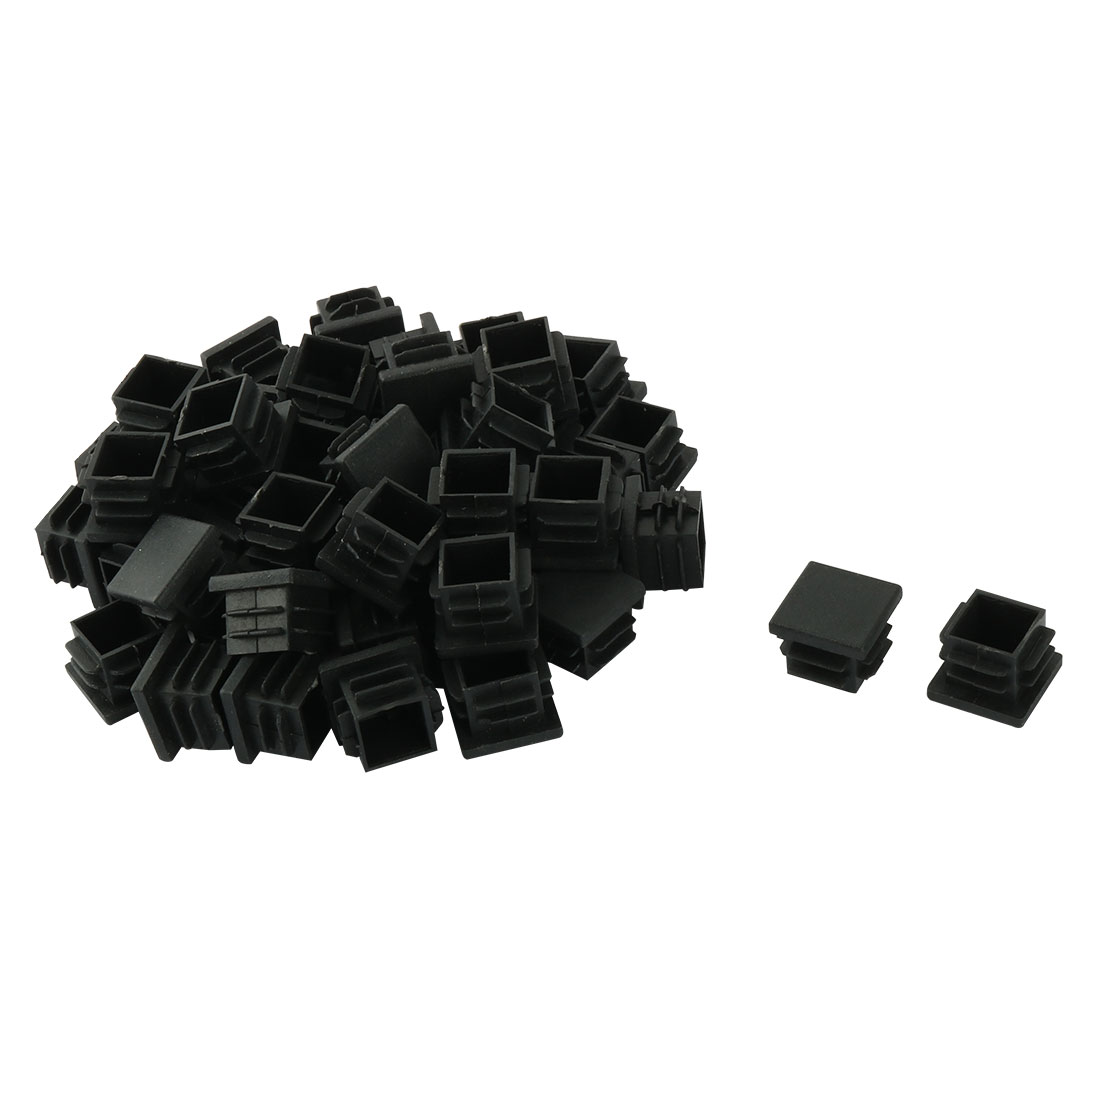 Plastic Square Design Tube Insert End Blanking Cover Cap Black 19 x 19mm 60pcs